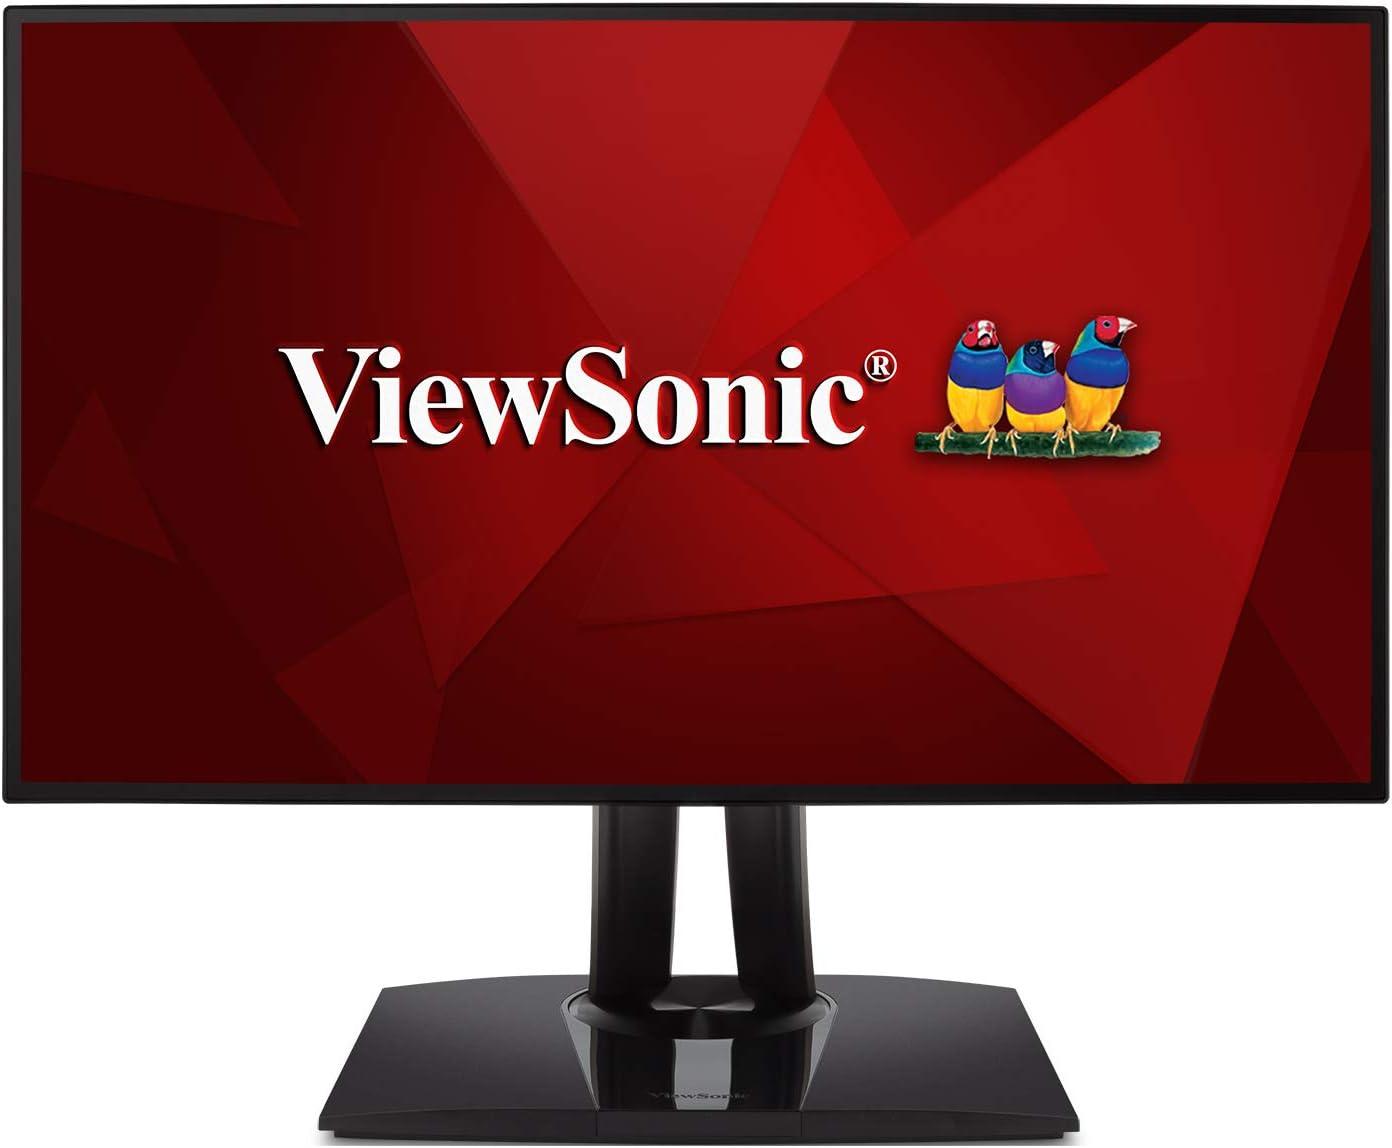 ViewSonic VP2768-4K PRO